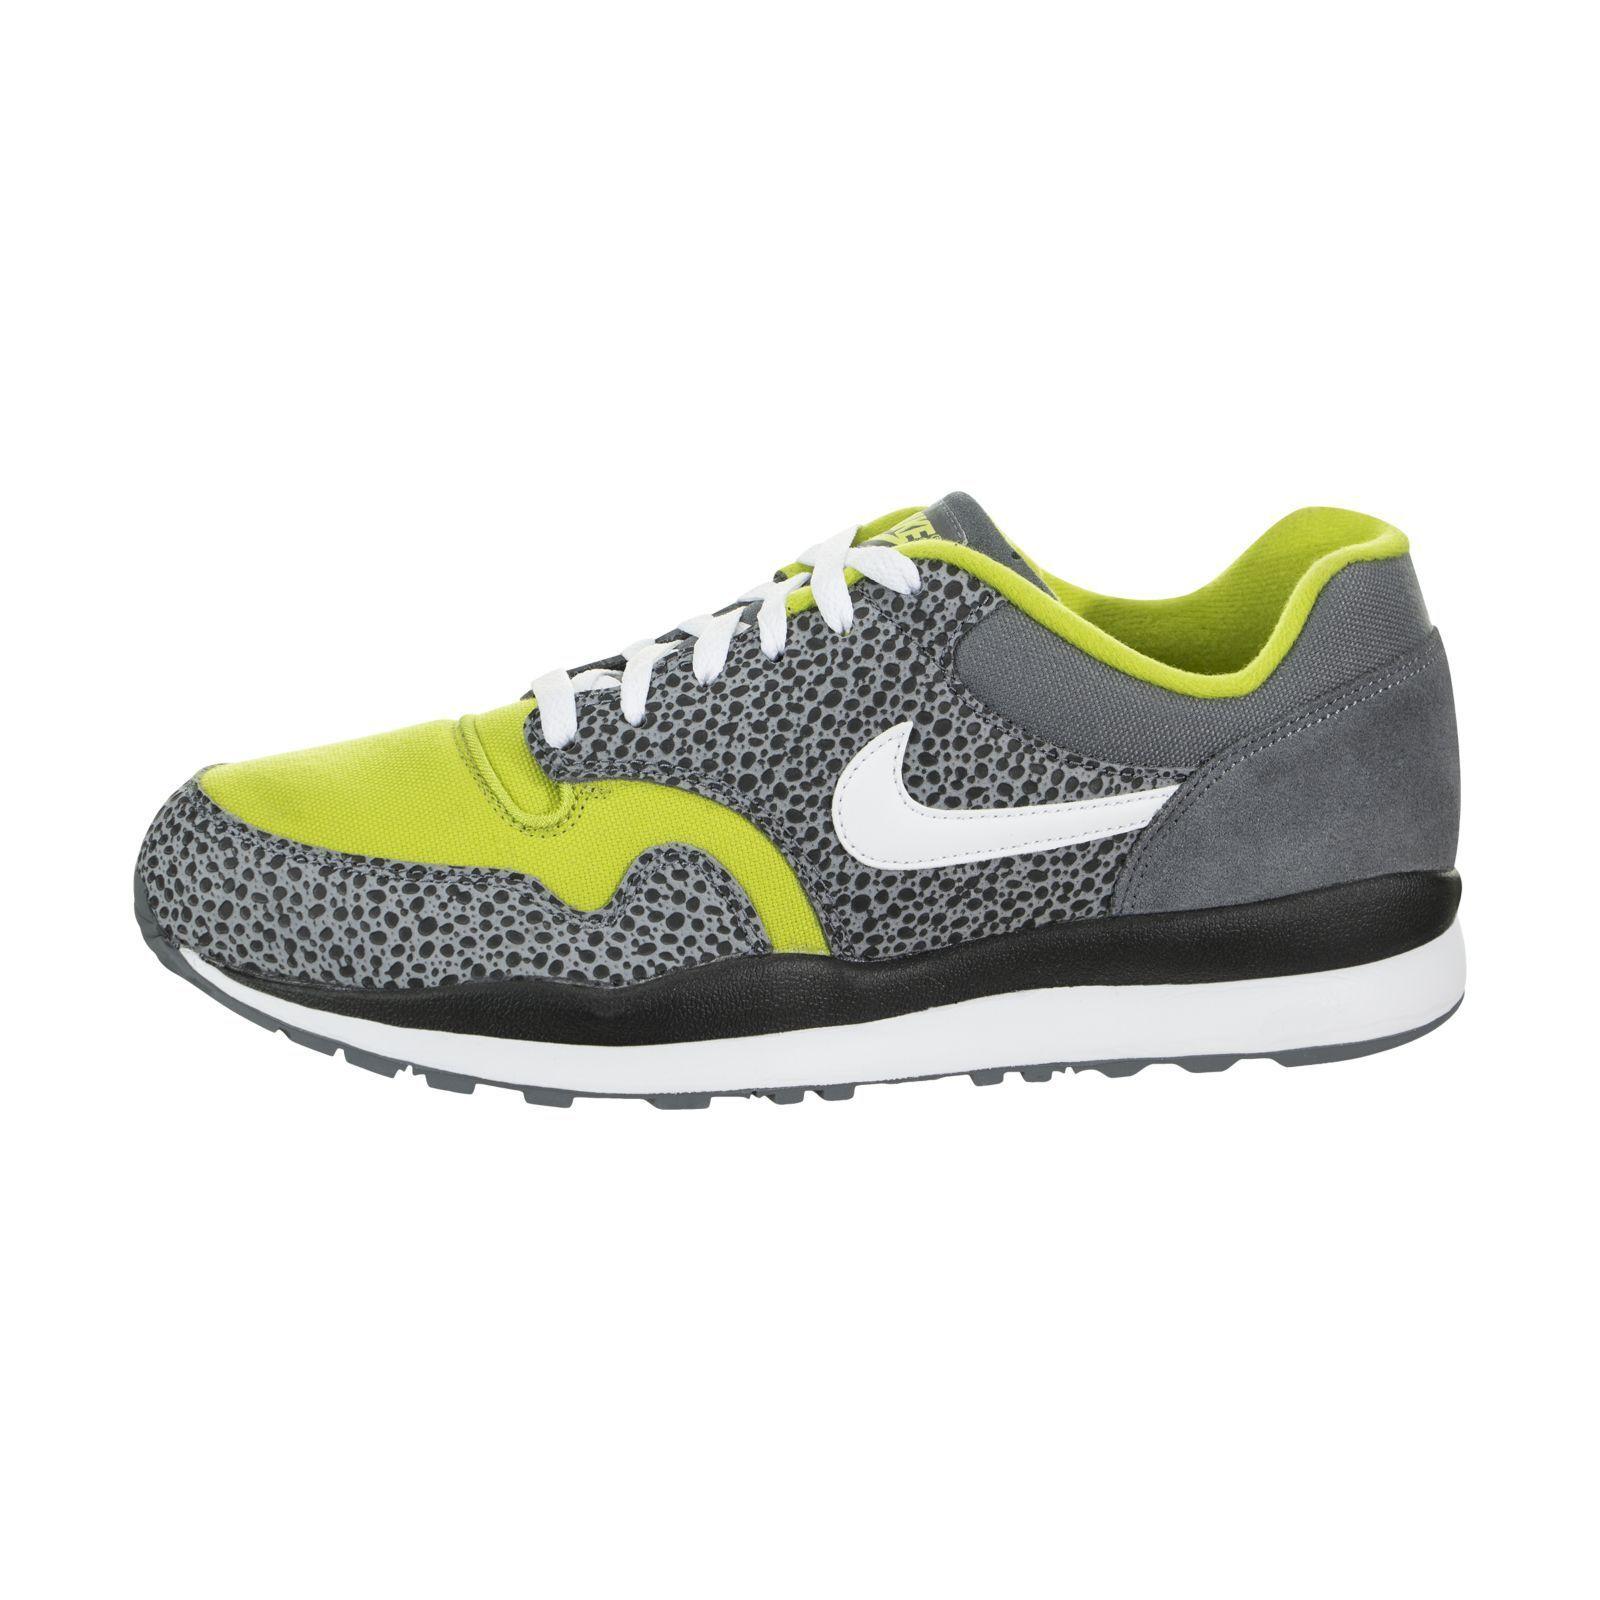 Nike air safari se flint grigio / bianco brillante cact